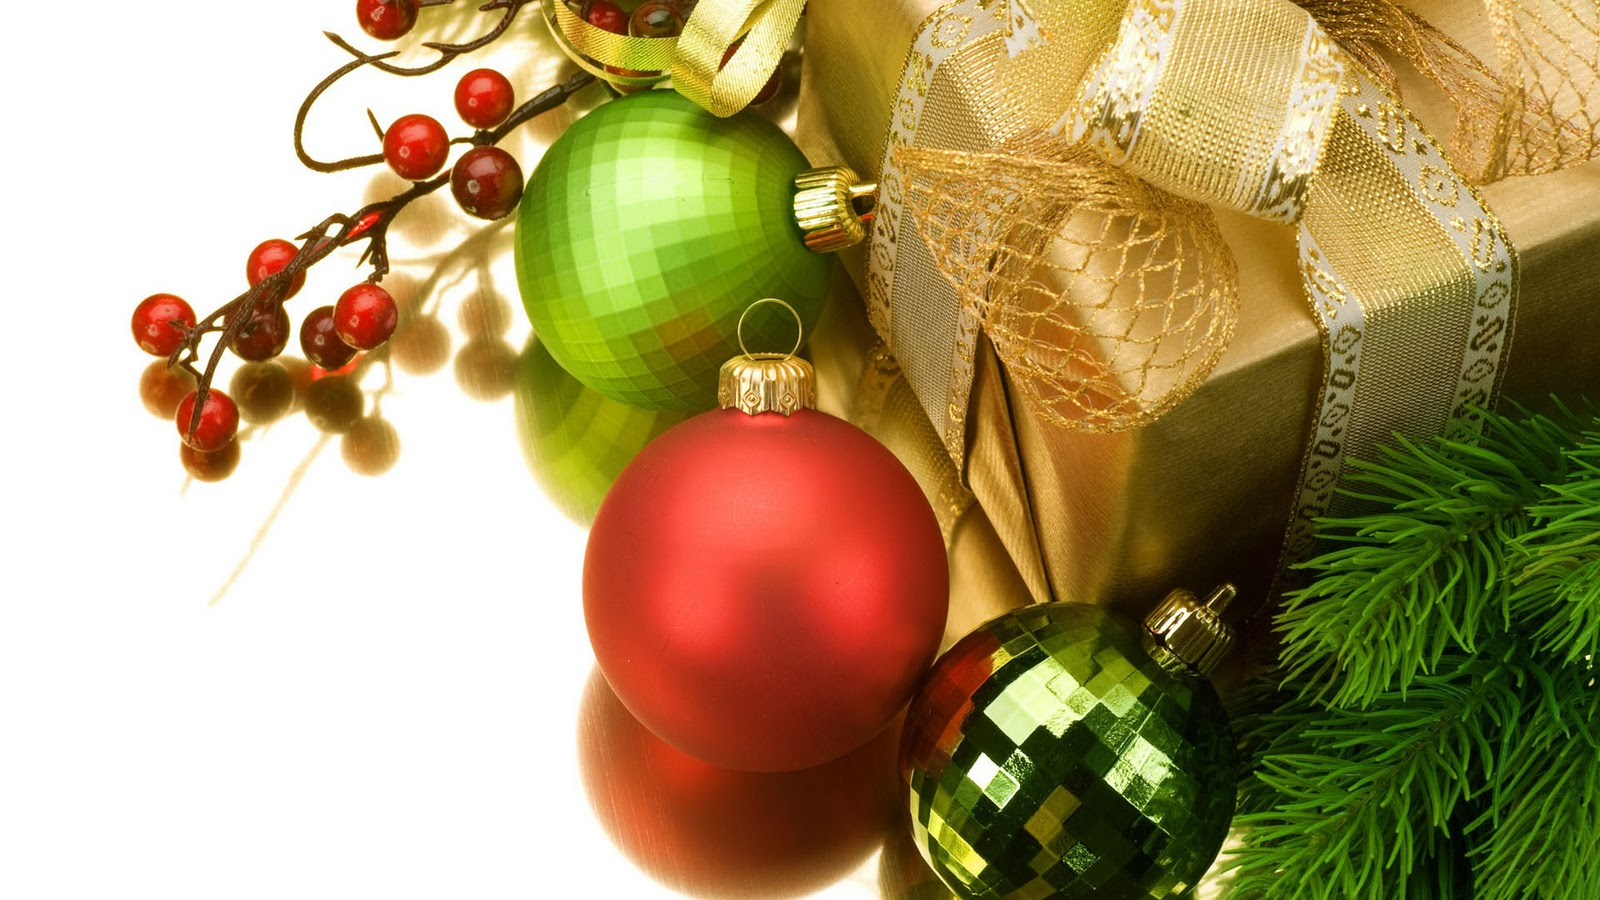 http://2.bp.blogspot.com/-LiMdr0sS2g8/Tqk3BdfcMnI/AAAAAAAAOro/9t8Nc26vtj8/s1600/Mooie-kerst-achtergronden-leuke-hd-kerst-wallpapers-afbeeldingen-plaatjes-foto-17.jpg